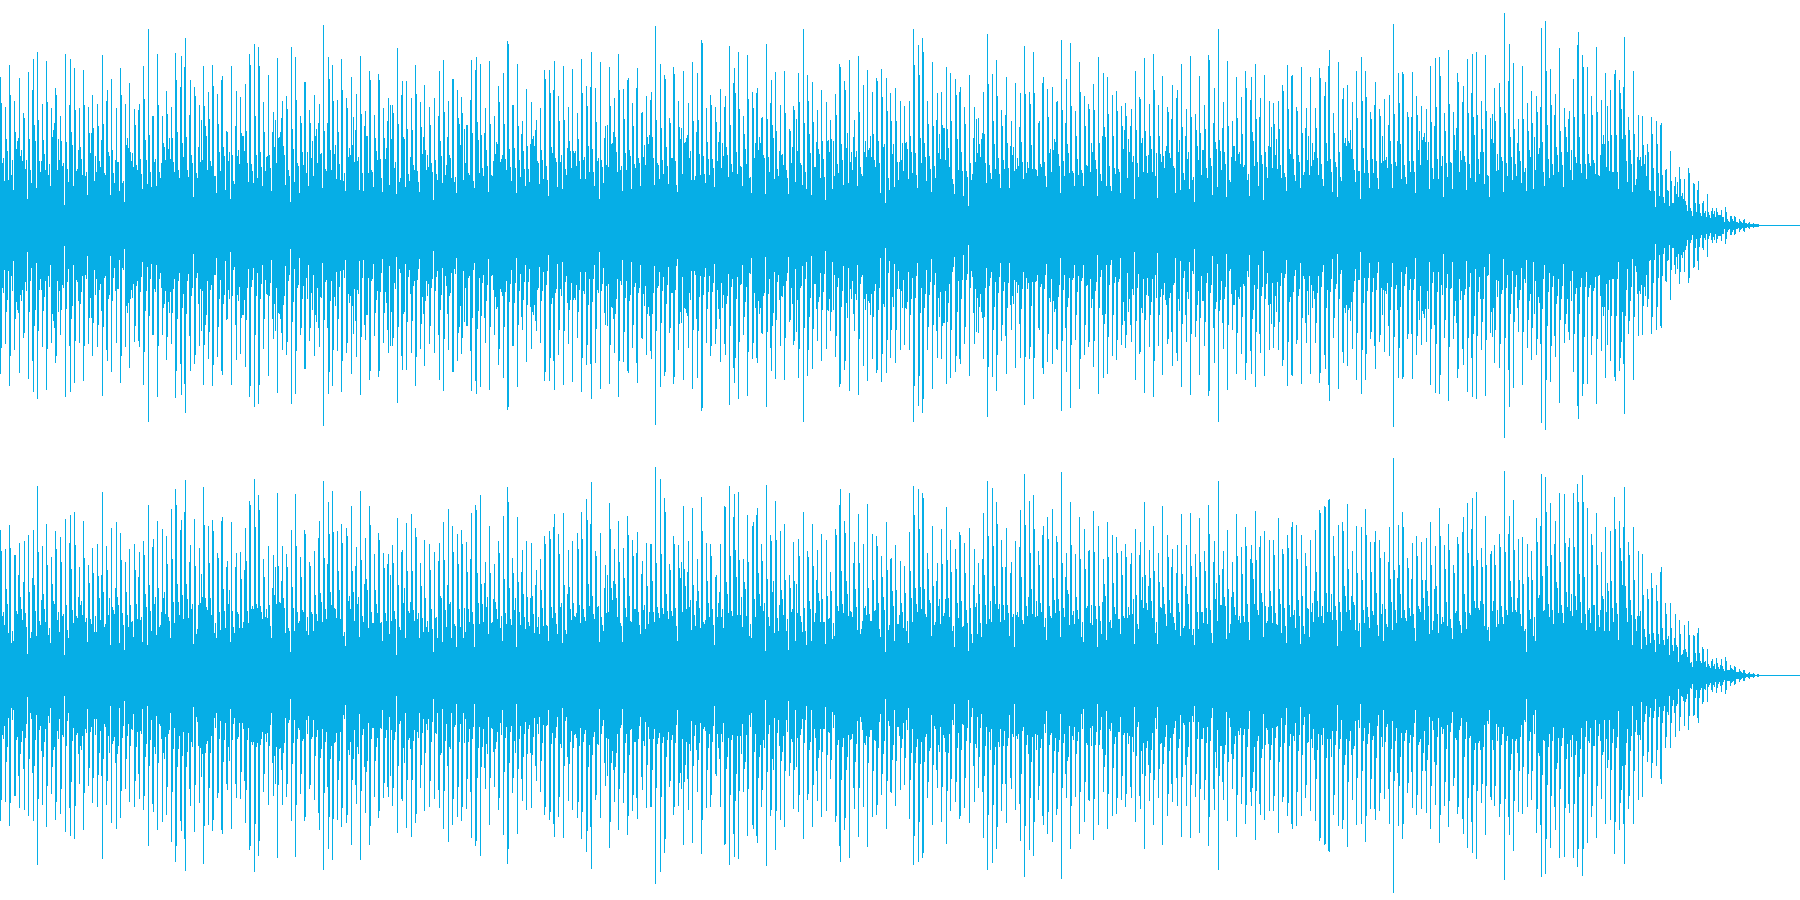 8bitクラシック-Ave Maria-の再生済みの波形